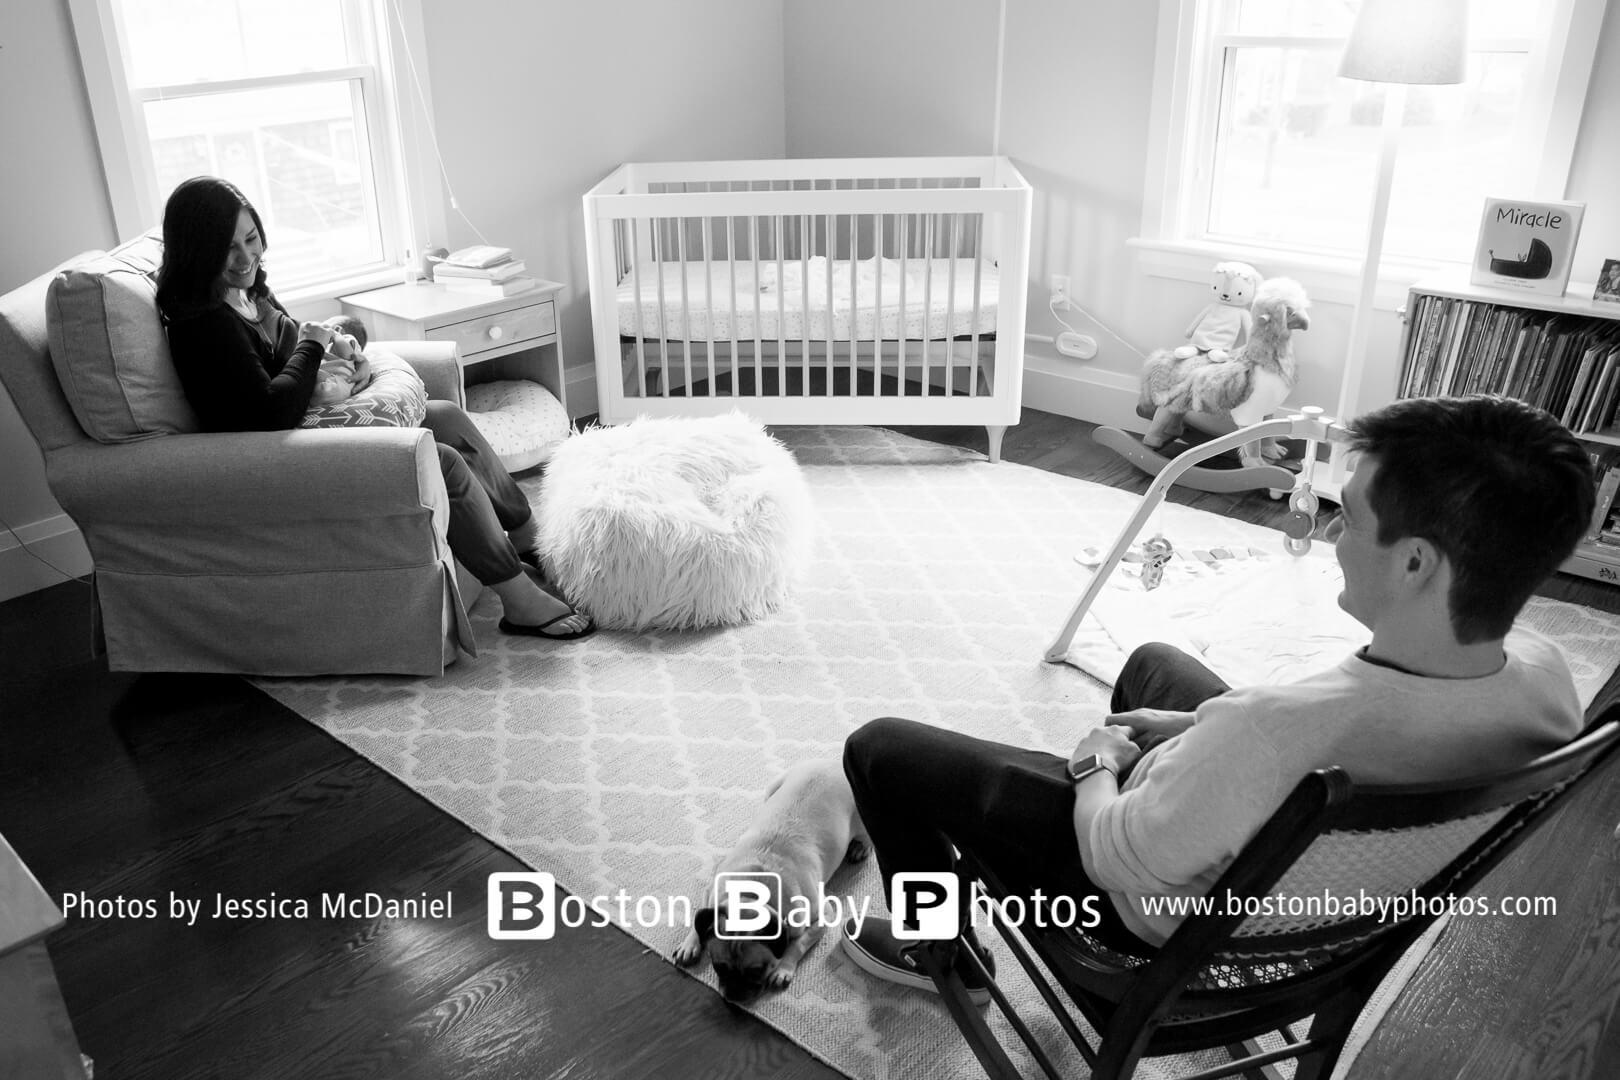 Milton, MA: A sweet new baby girl photoshoot